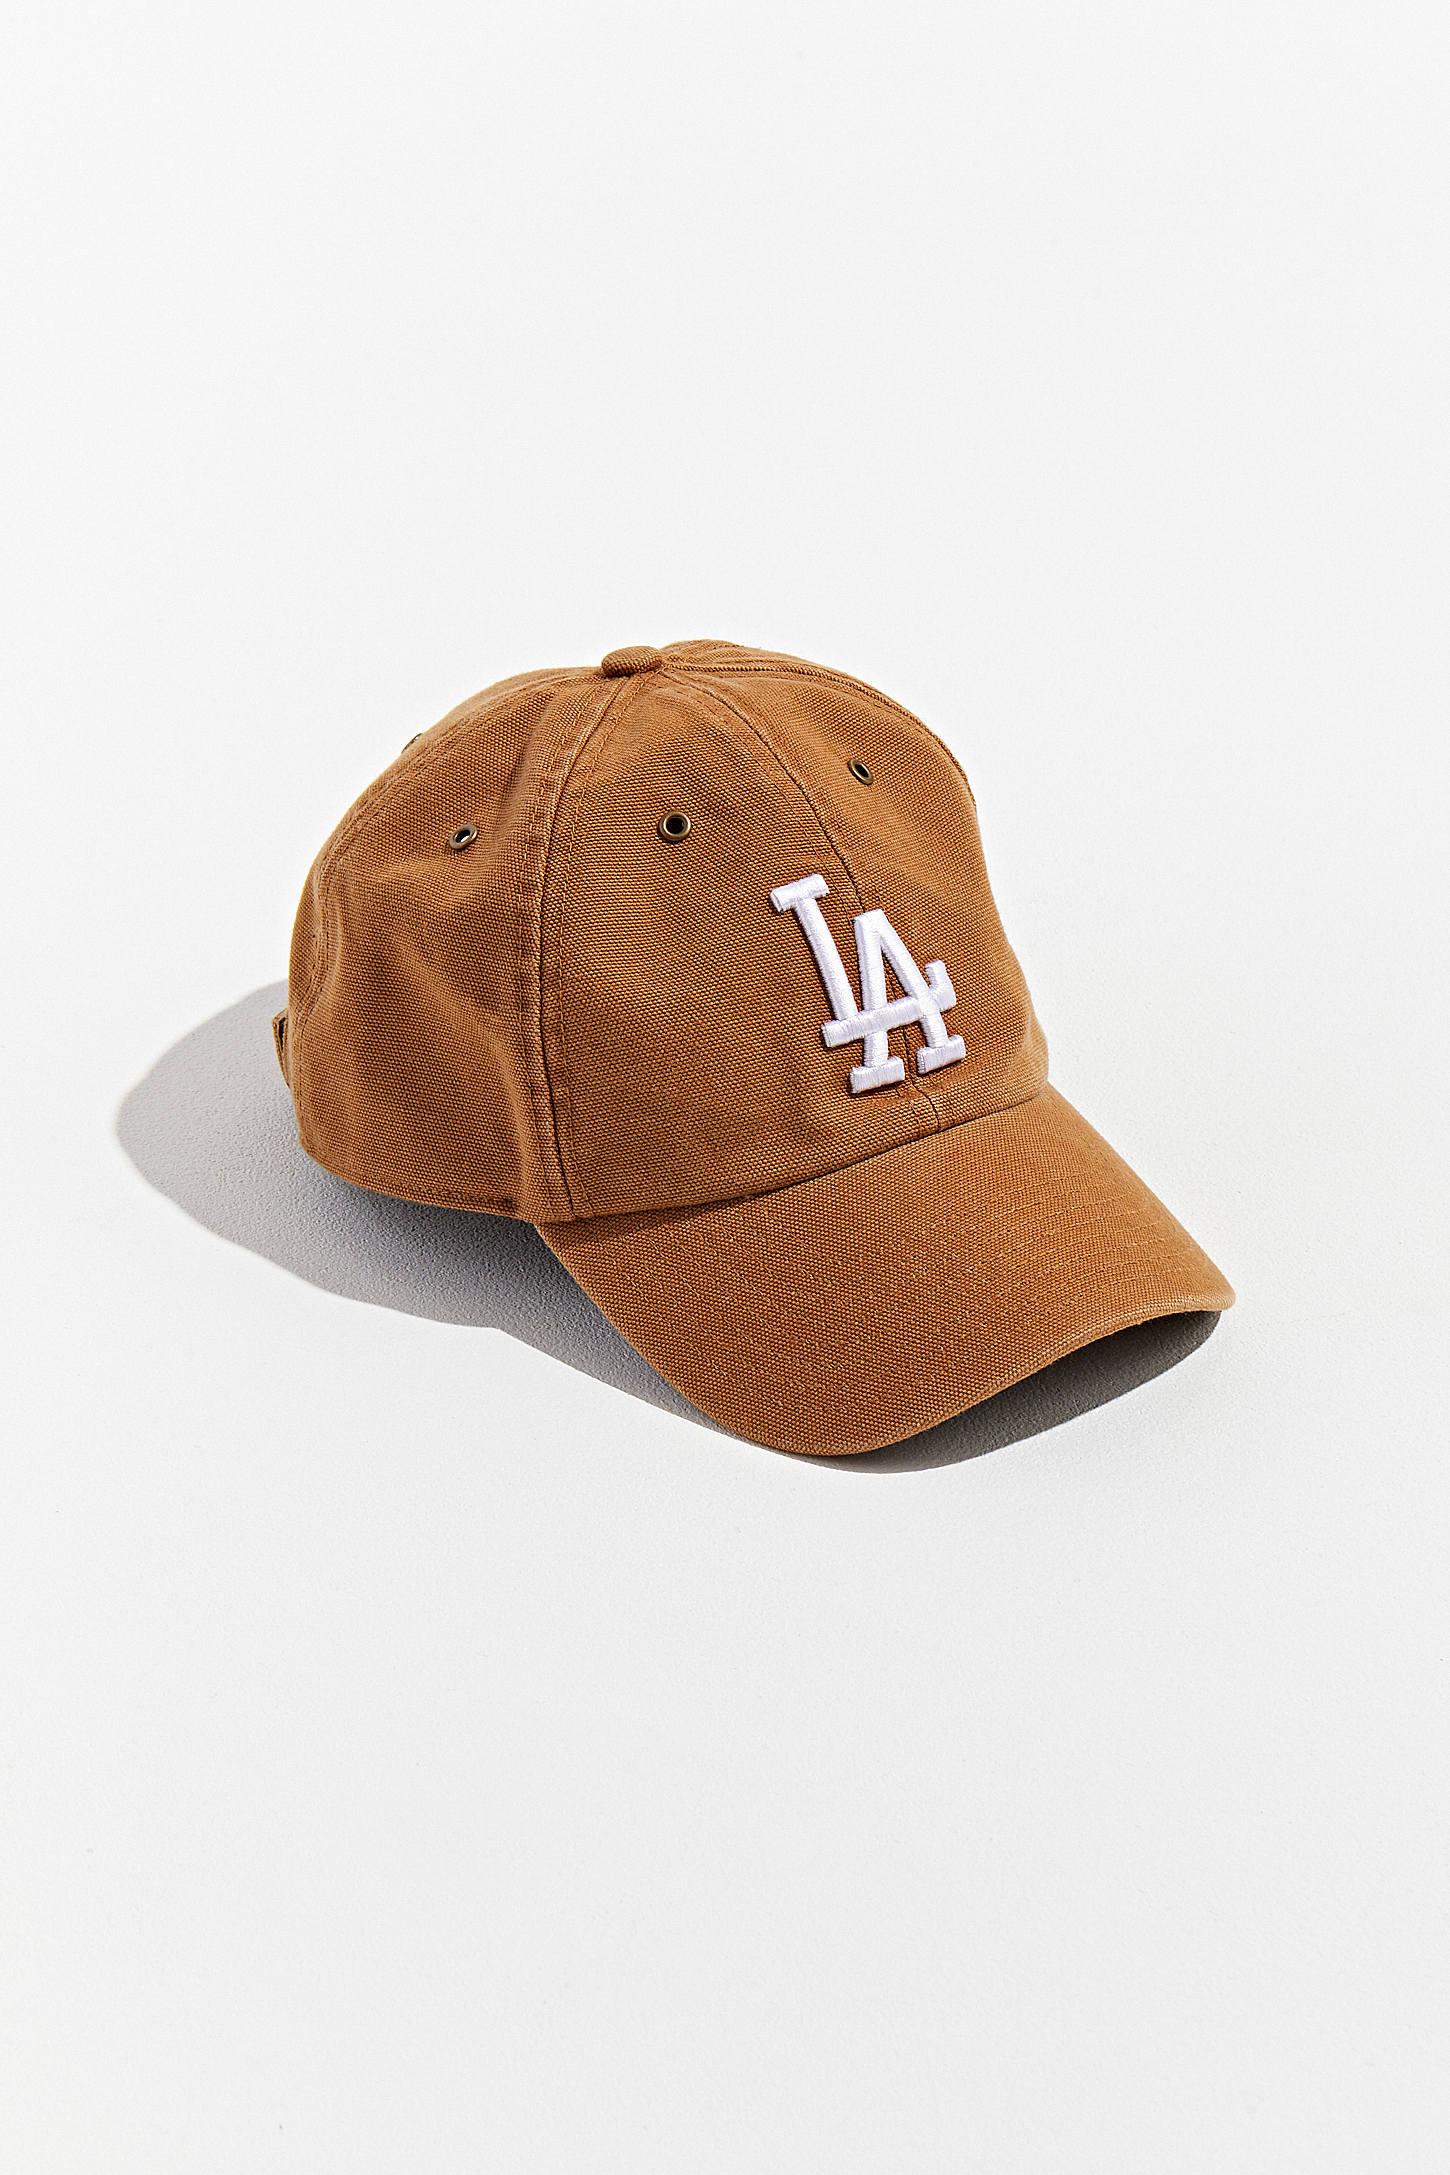 47 Brand X Carhartt Los Angeles Dodgers Dad Baseball Hat Baseball Hats La Dodgers Hat Dodger Hats